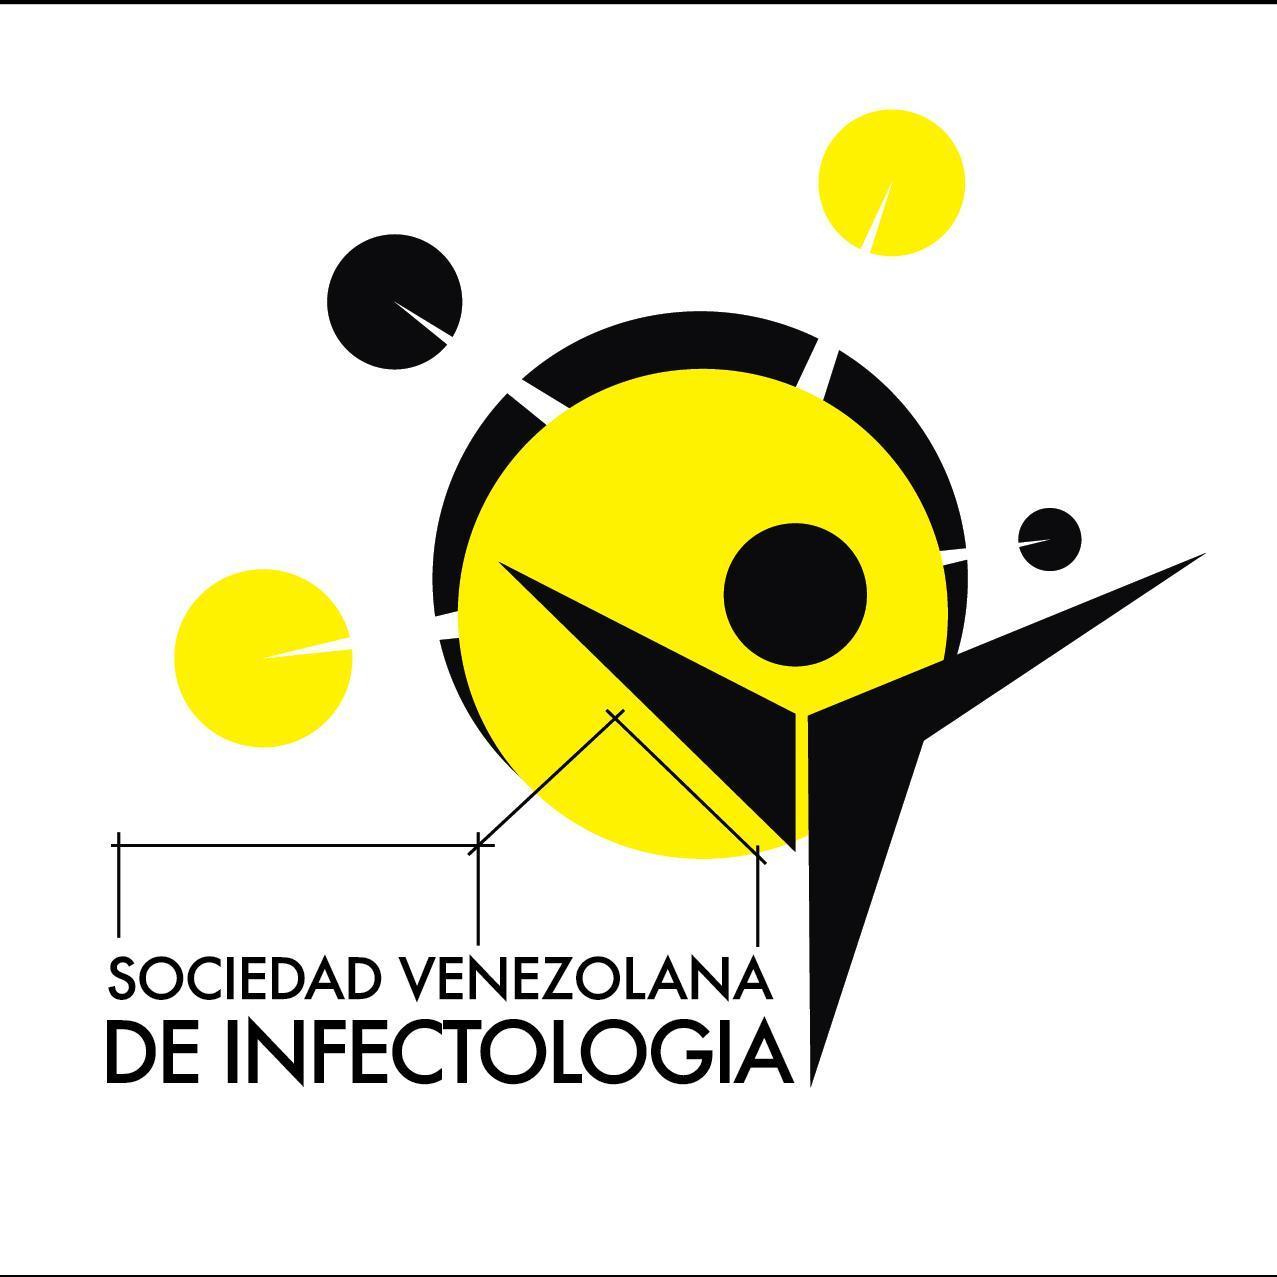 logo-sociedad-venezolana-infectologia